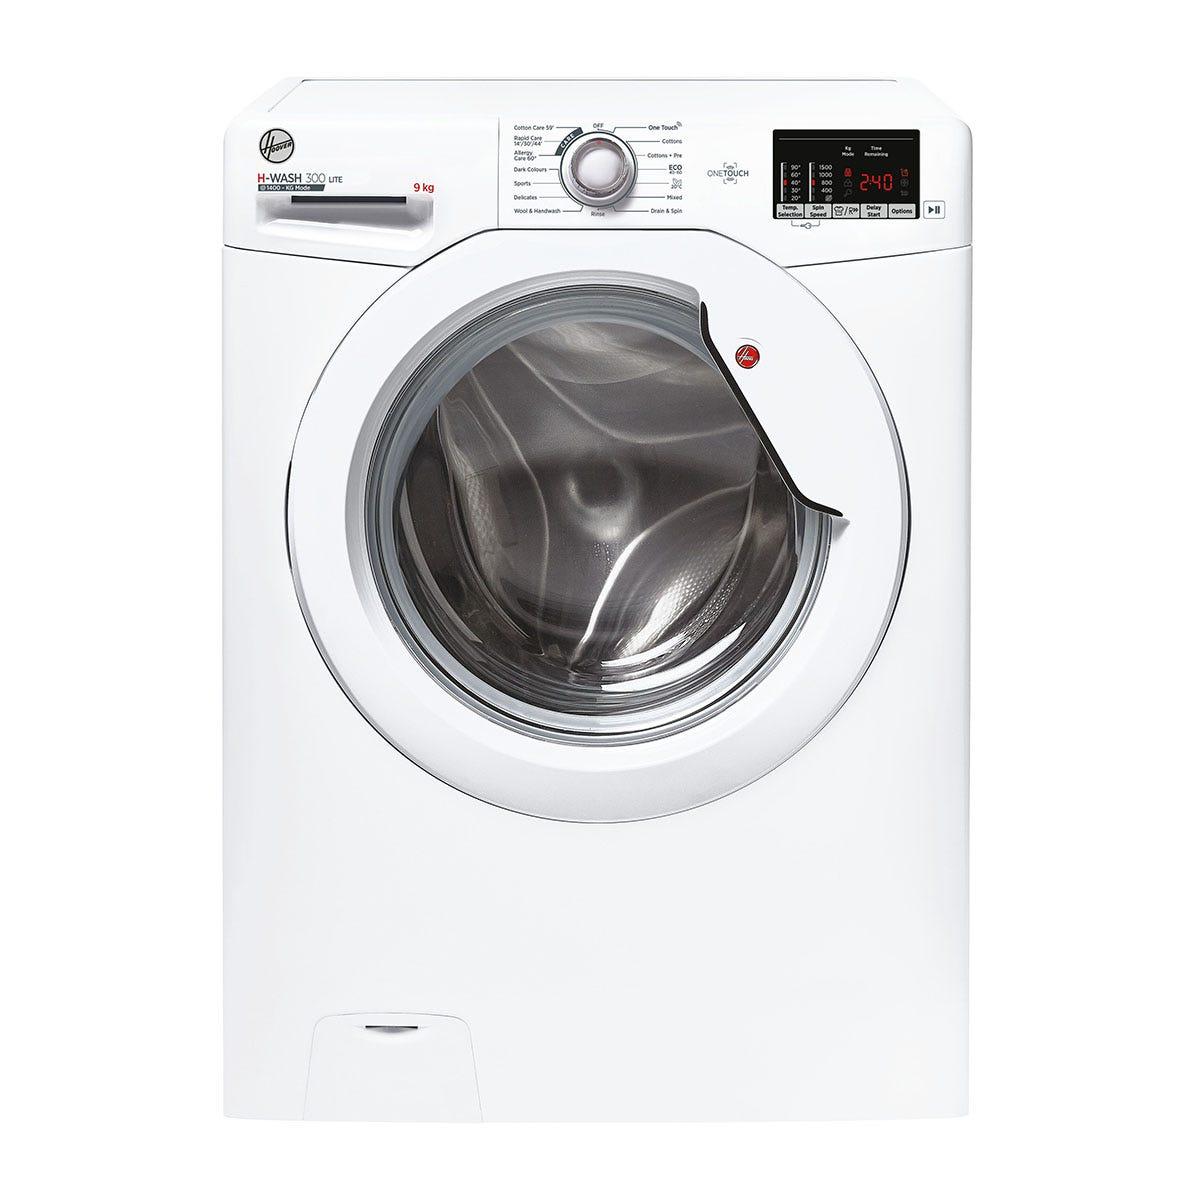 Hoover H3W 592DE H-Wash 300 9kg 1500rpm Digital Washing Machine - White